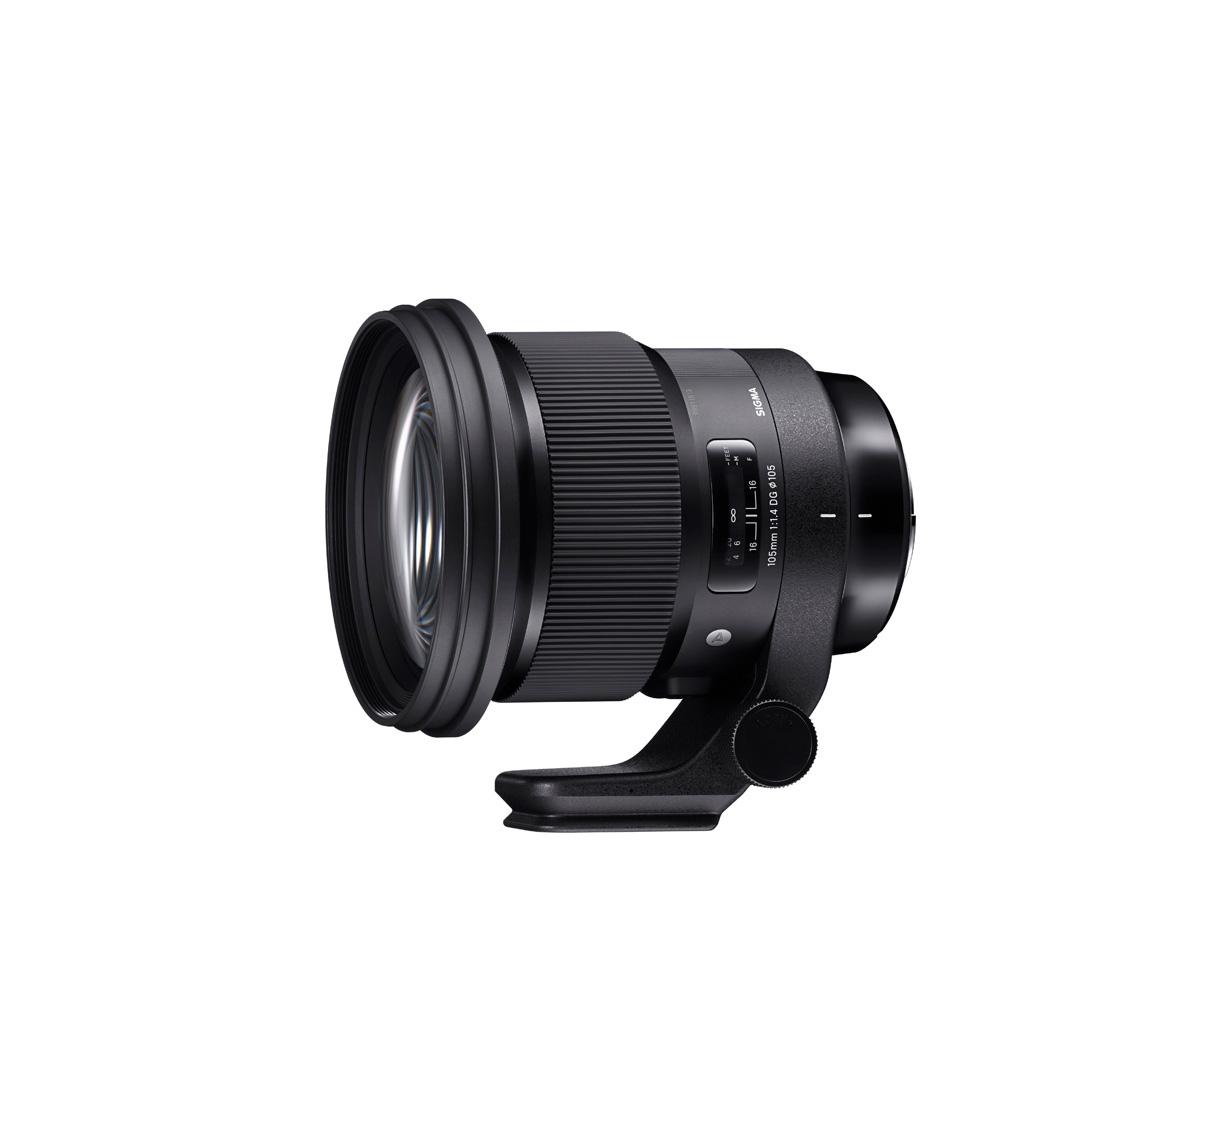 لنز Sigma 105mm f/1.4 DG HSM Art for Canon